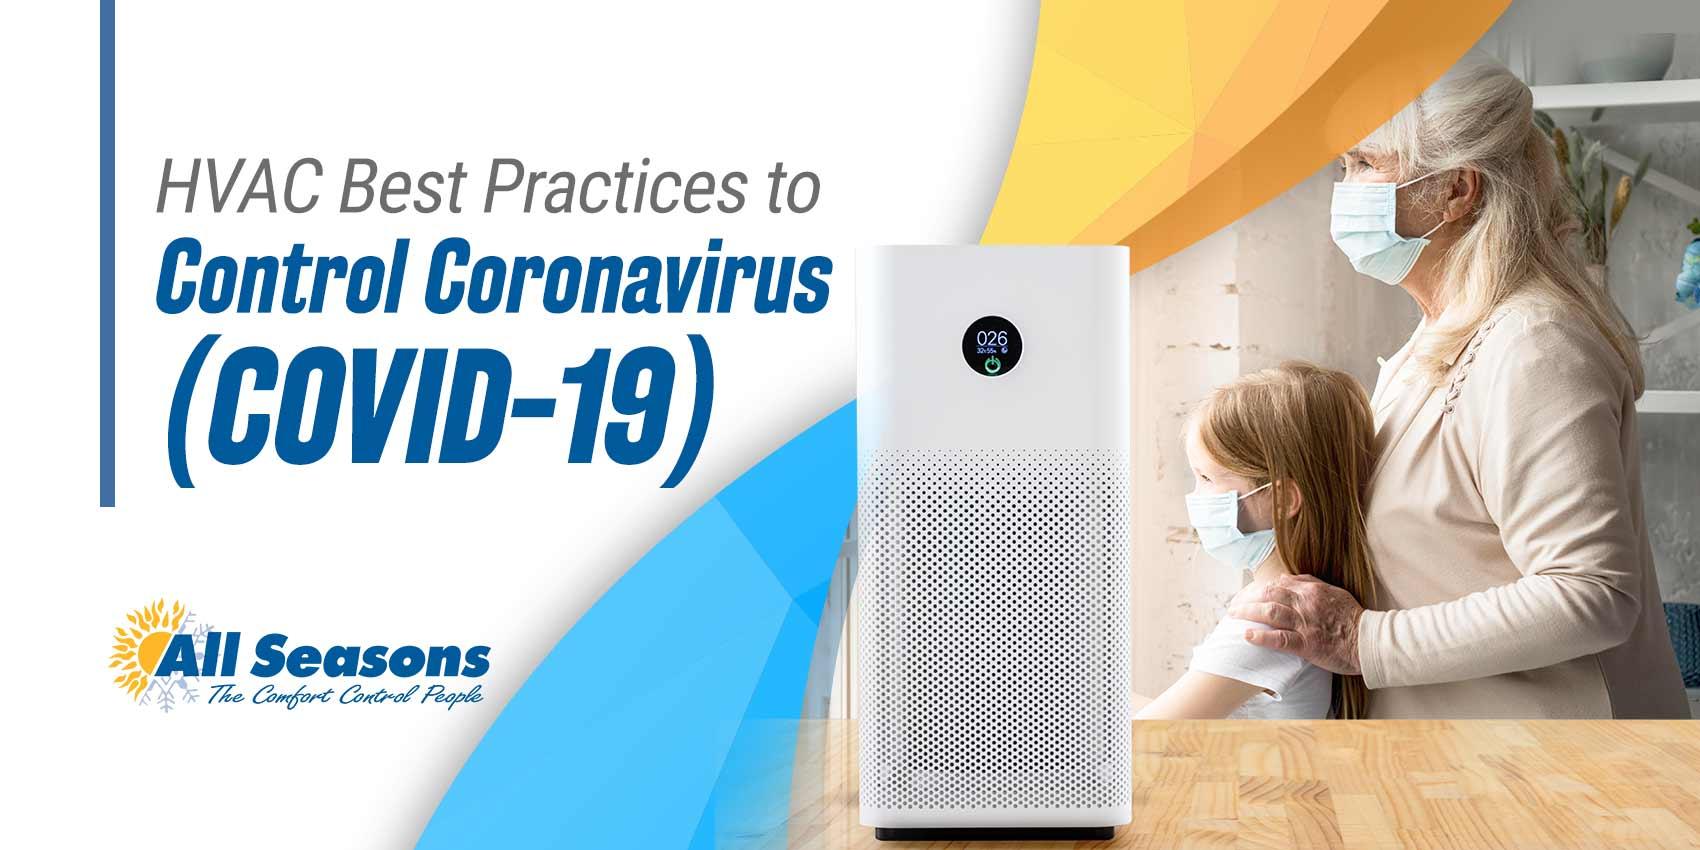 HVAC Best Practices to Control Coronavirus (COVID-19)